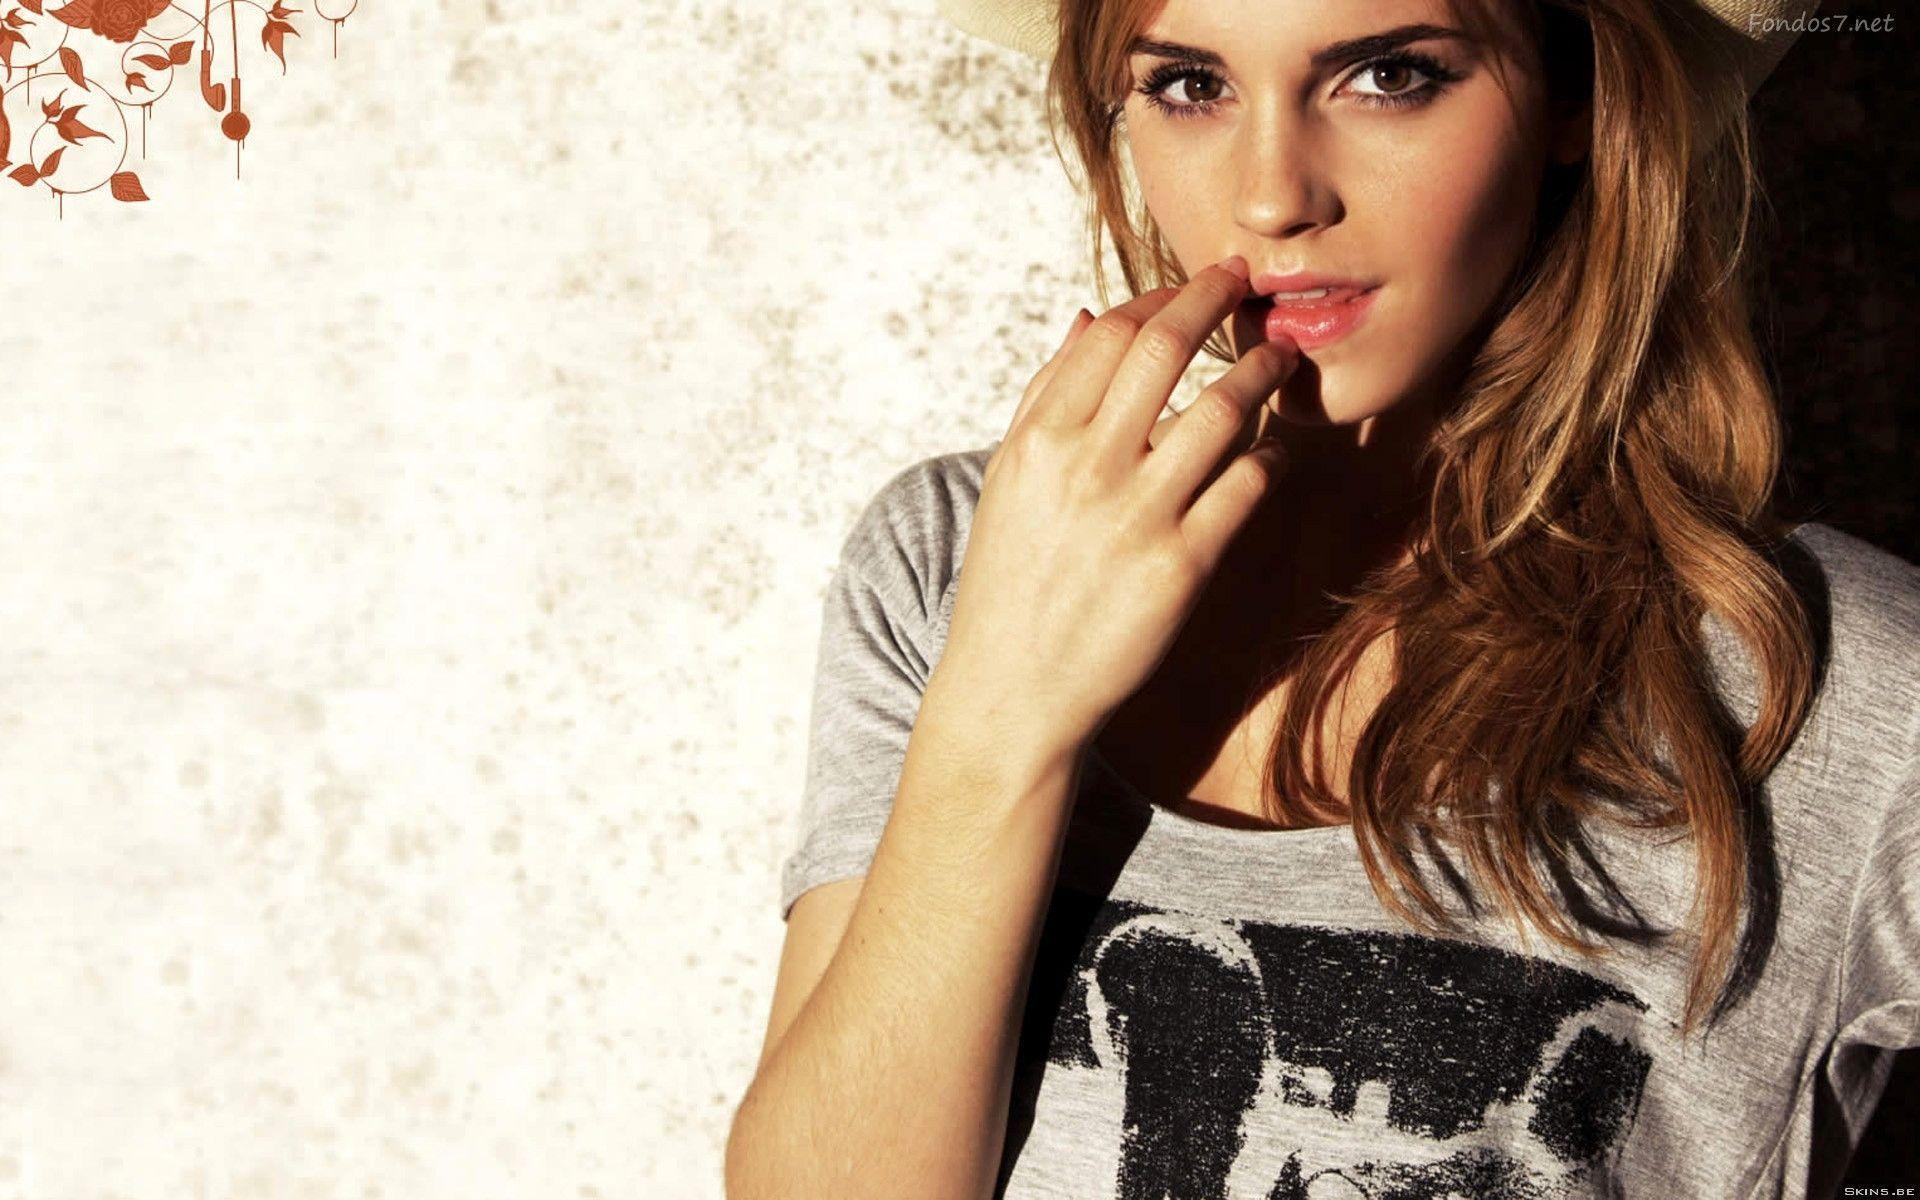 Emma Watson Wallpaper Hd 1920x1080 #1544 Wallpaper | lookwallpapers.